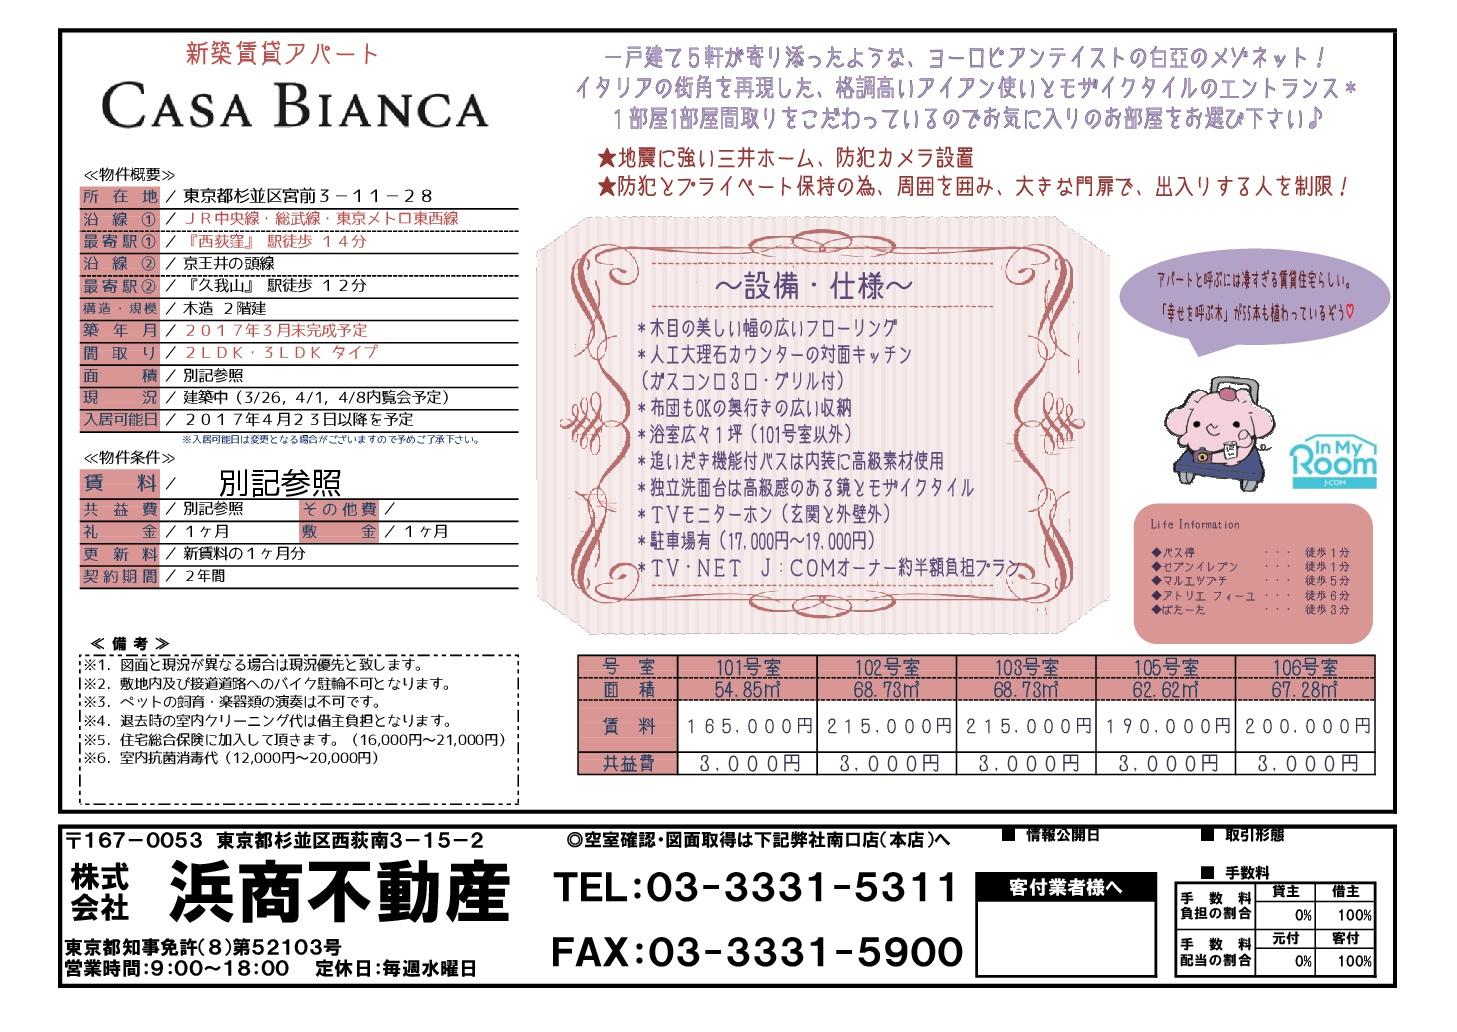 CASA-BIANCA-001